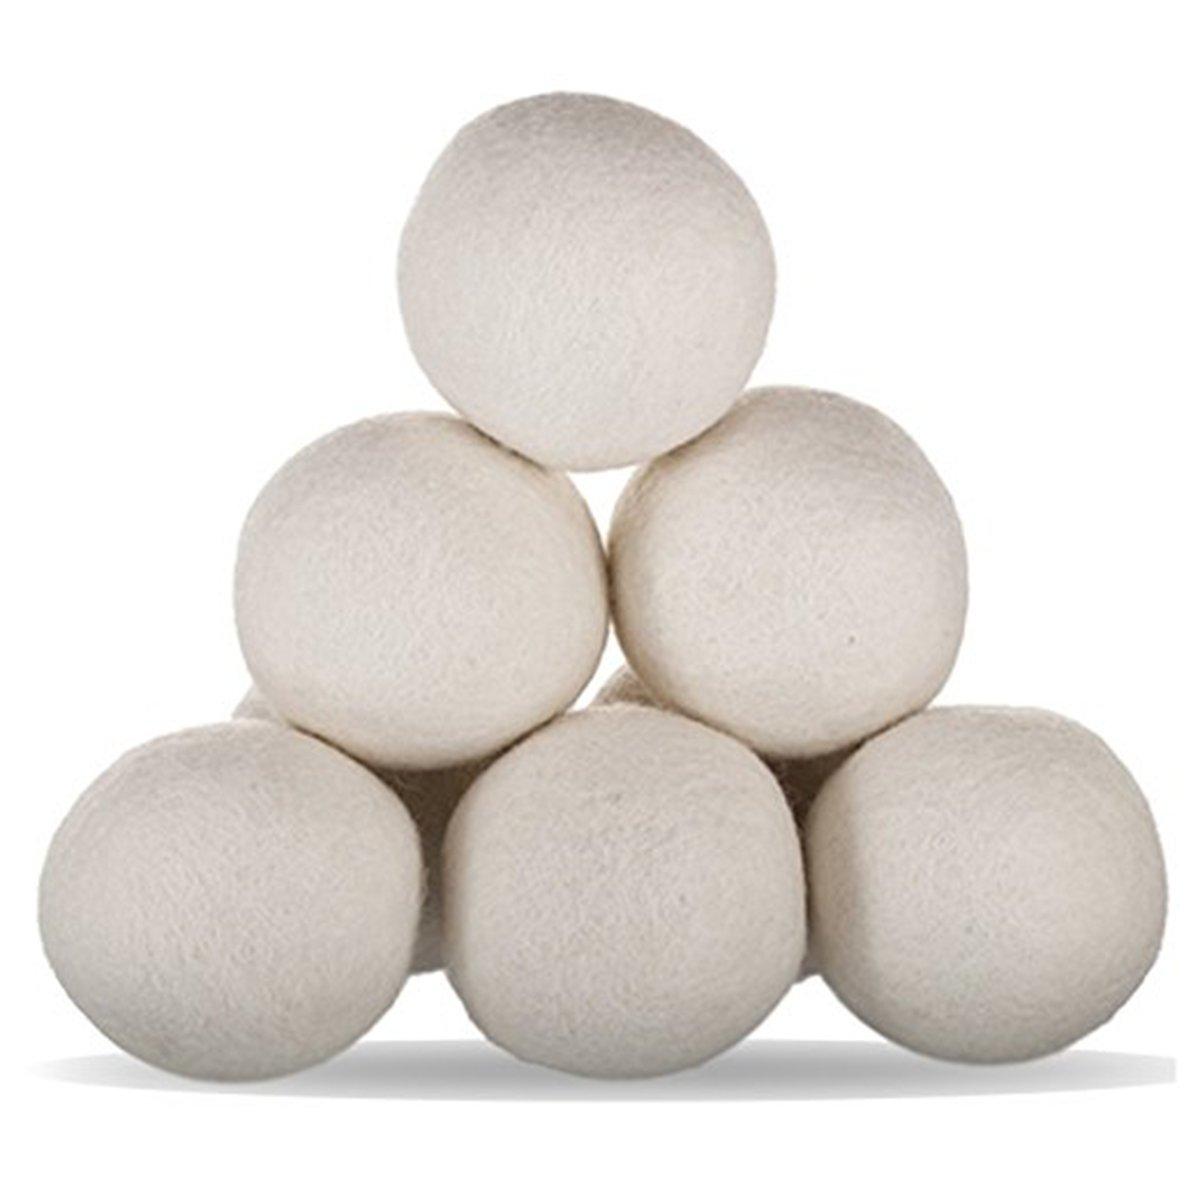 OUNONA Wool Dryer Balls Organic Wool Softener Laundry Balls 6pcs (White)